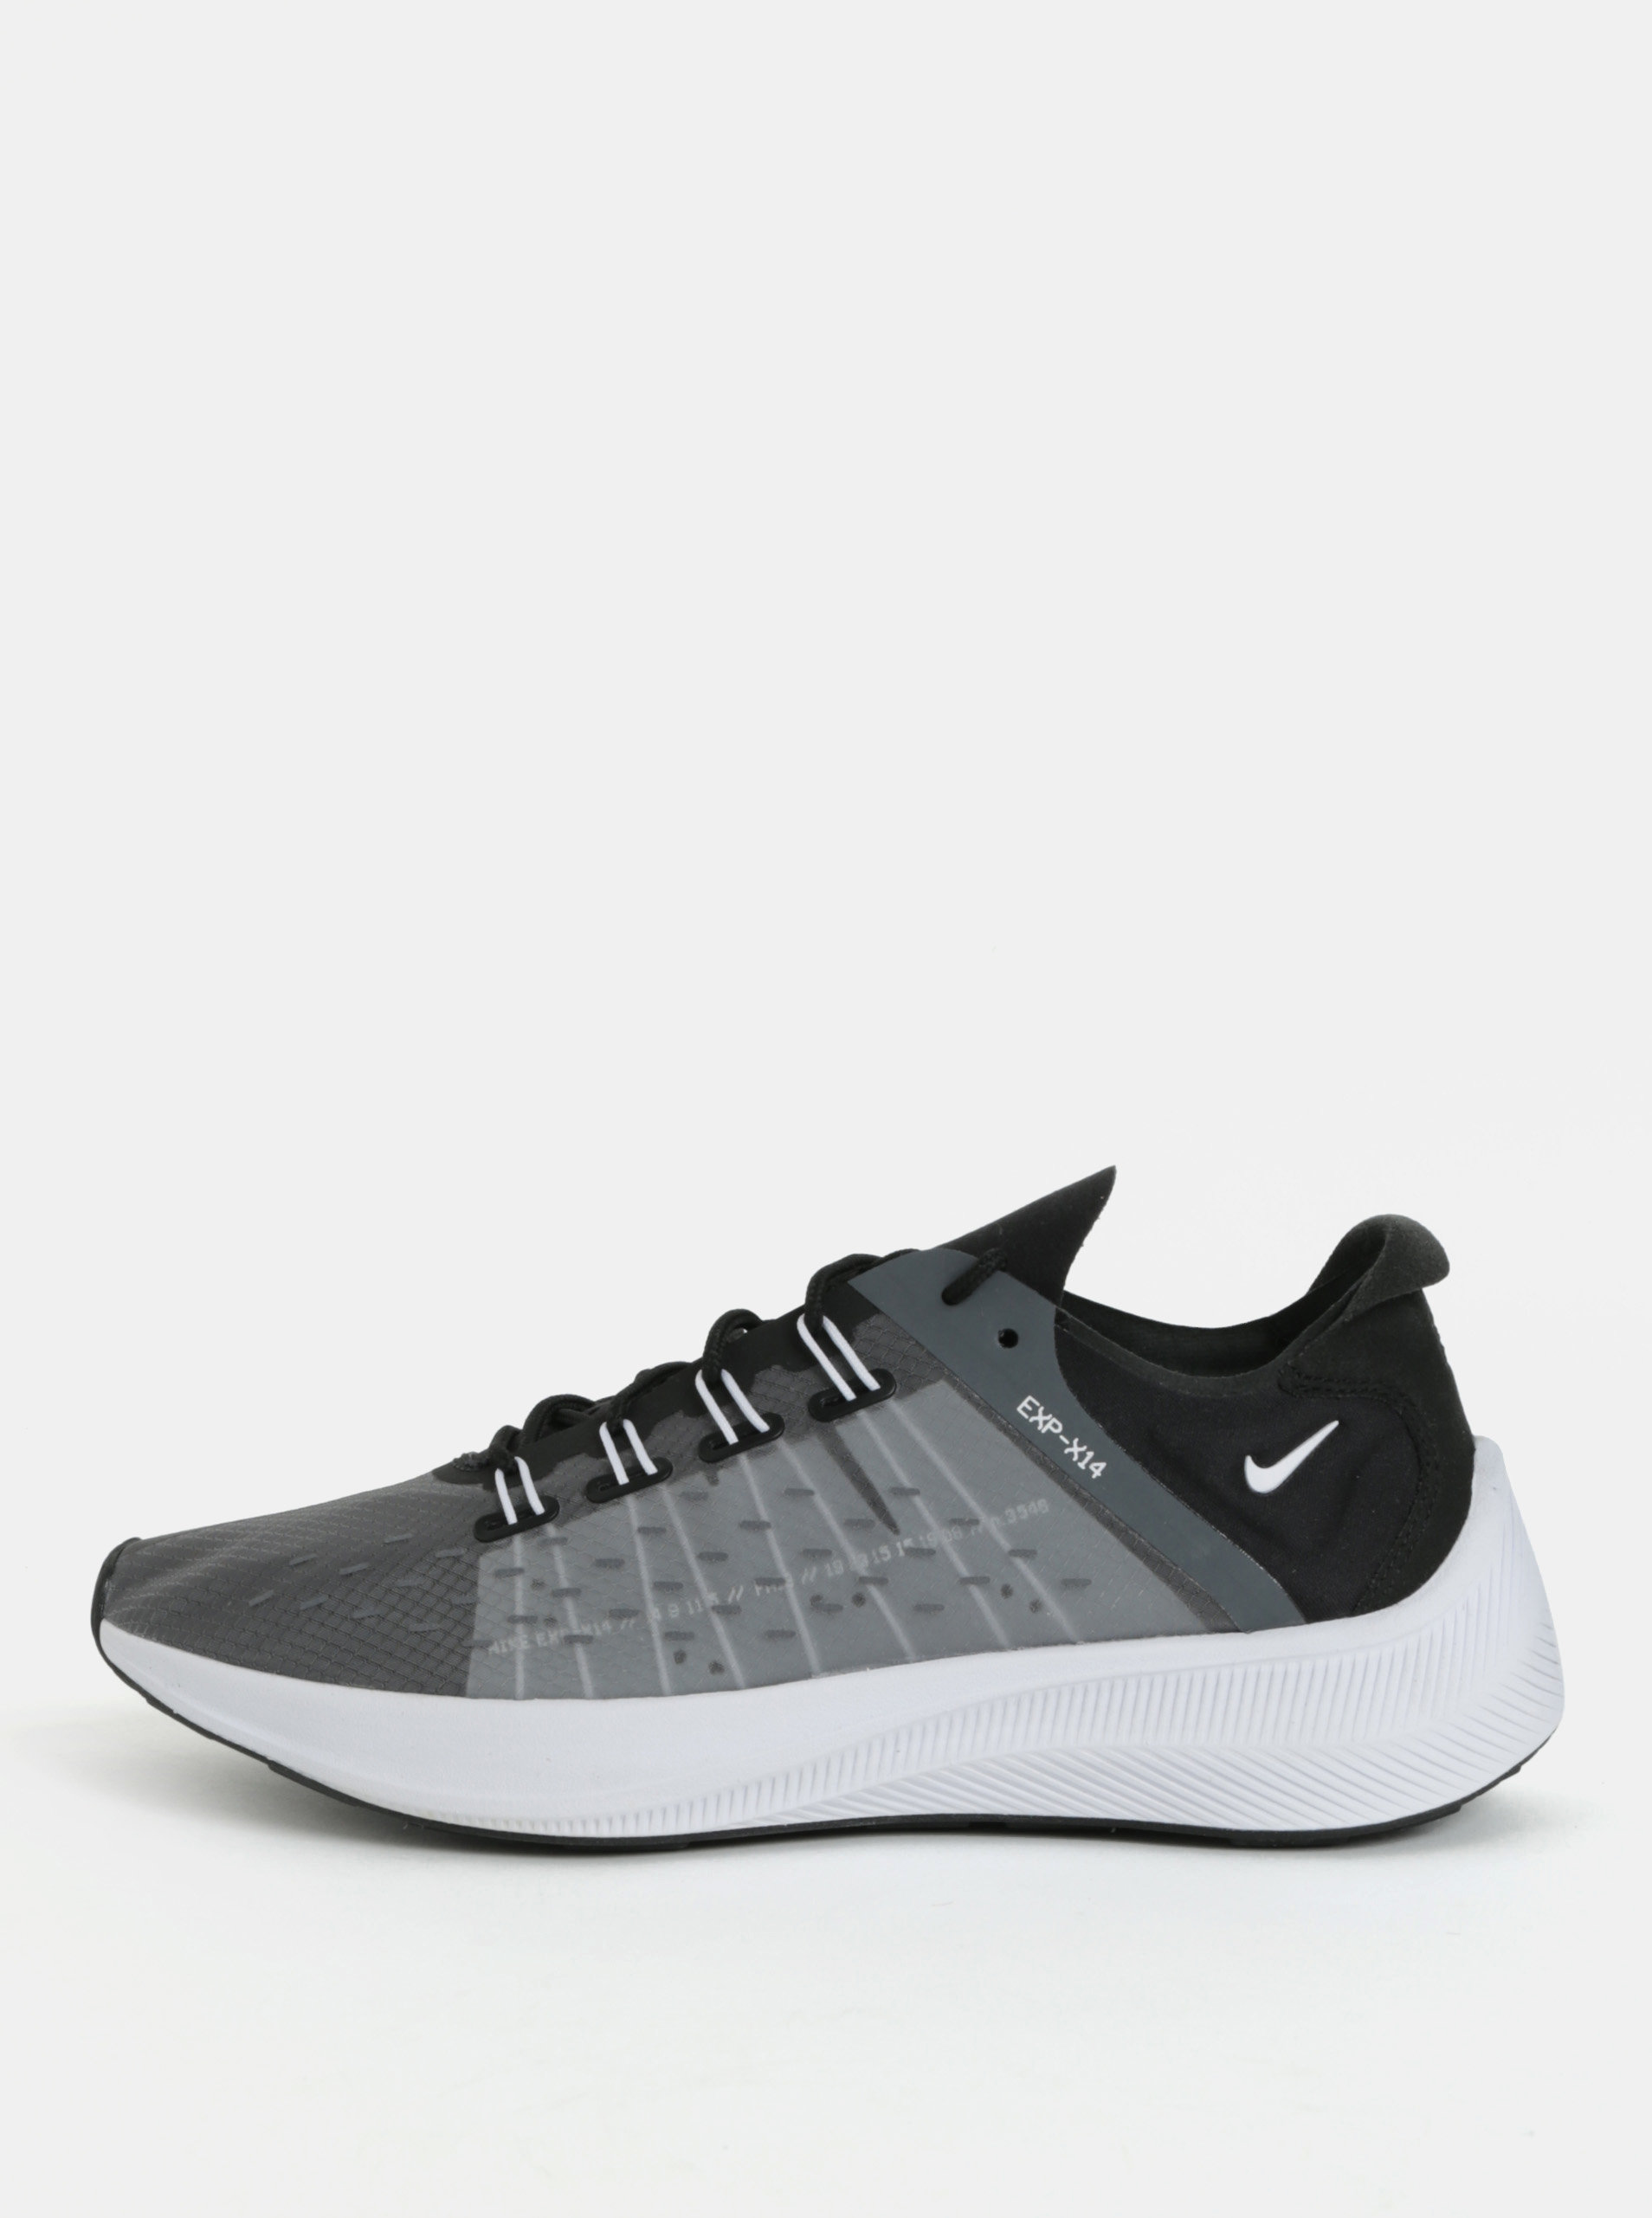 be8951212a Sivo-čierne dámske tenisky Nike EXP - X 14 ...